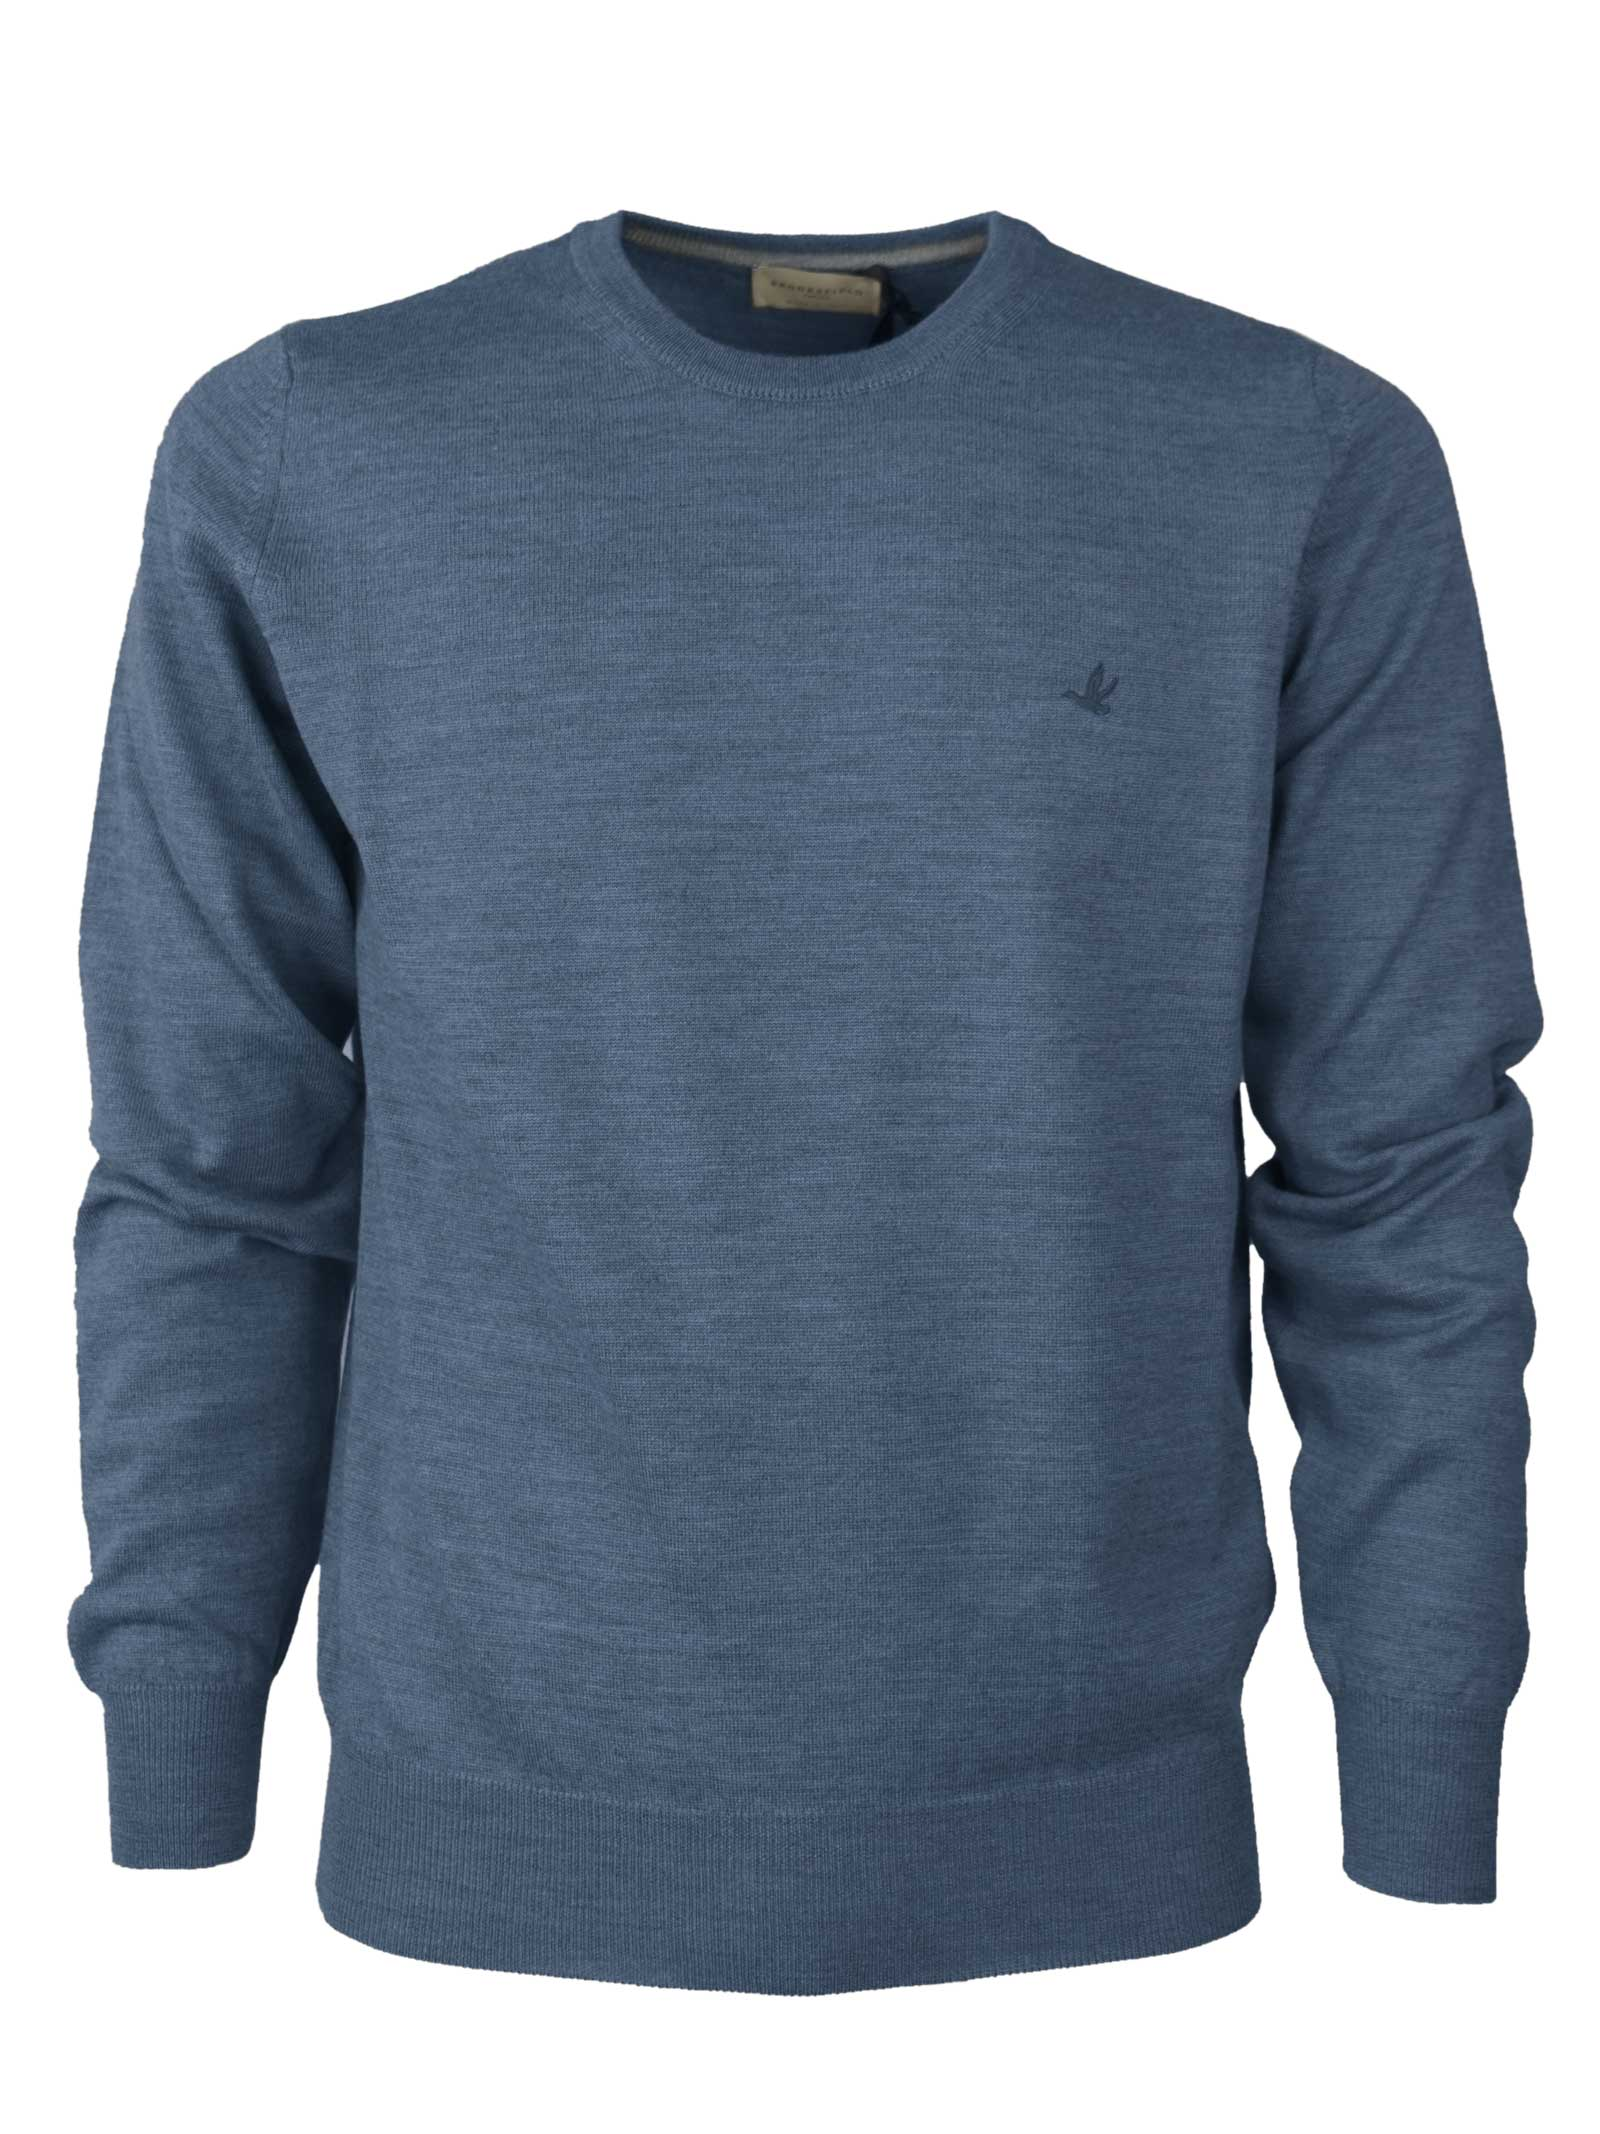 Crew neck pullover BROOKSFIELD   Knitwear   203E.P0010033